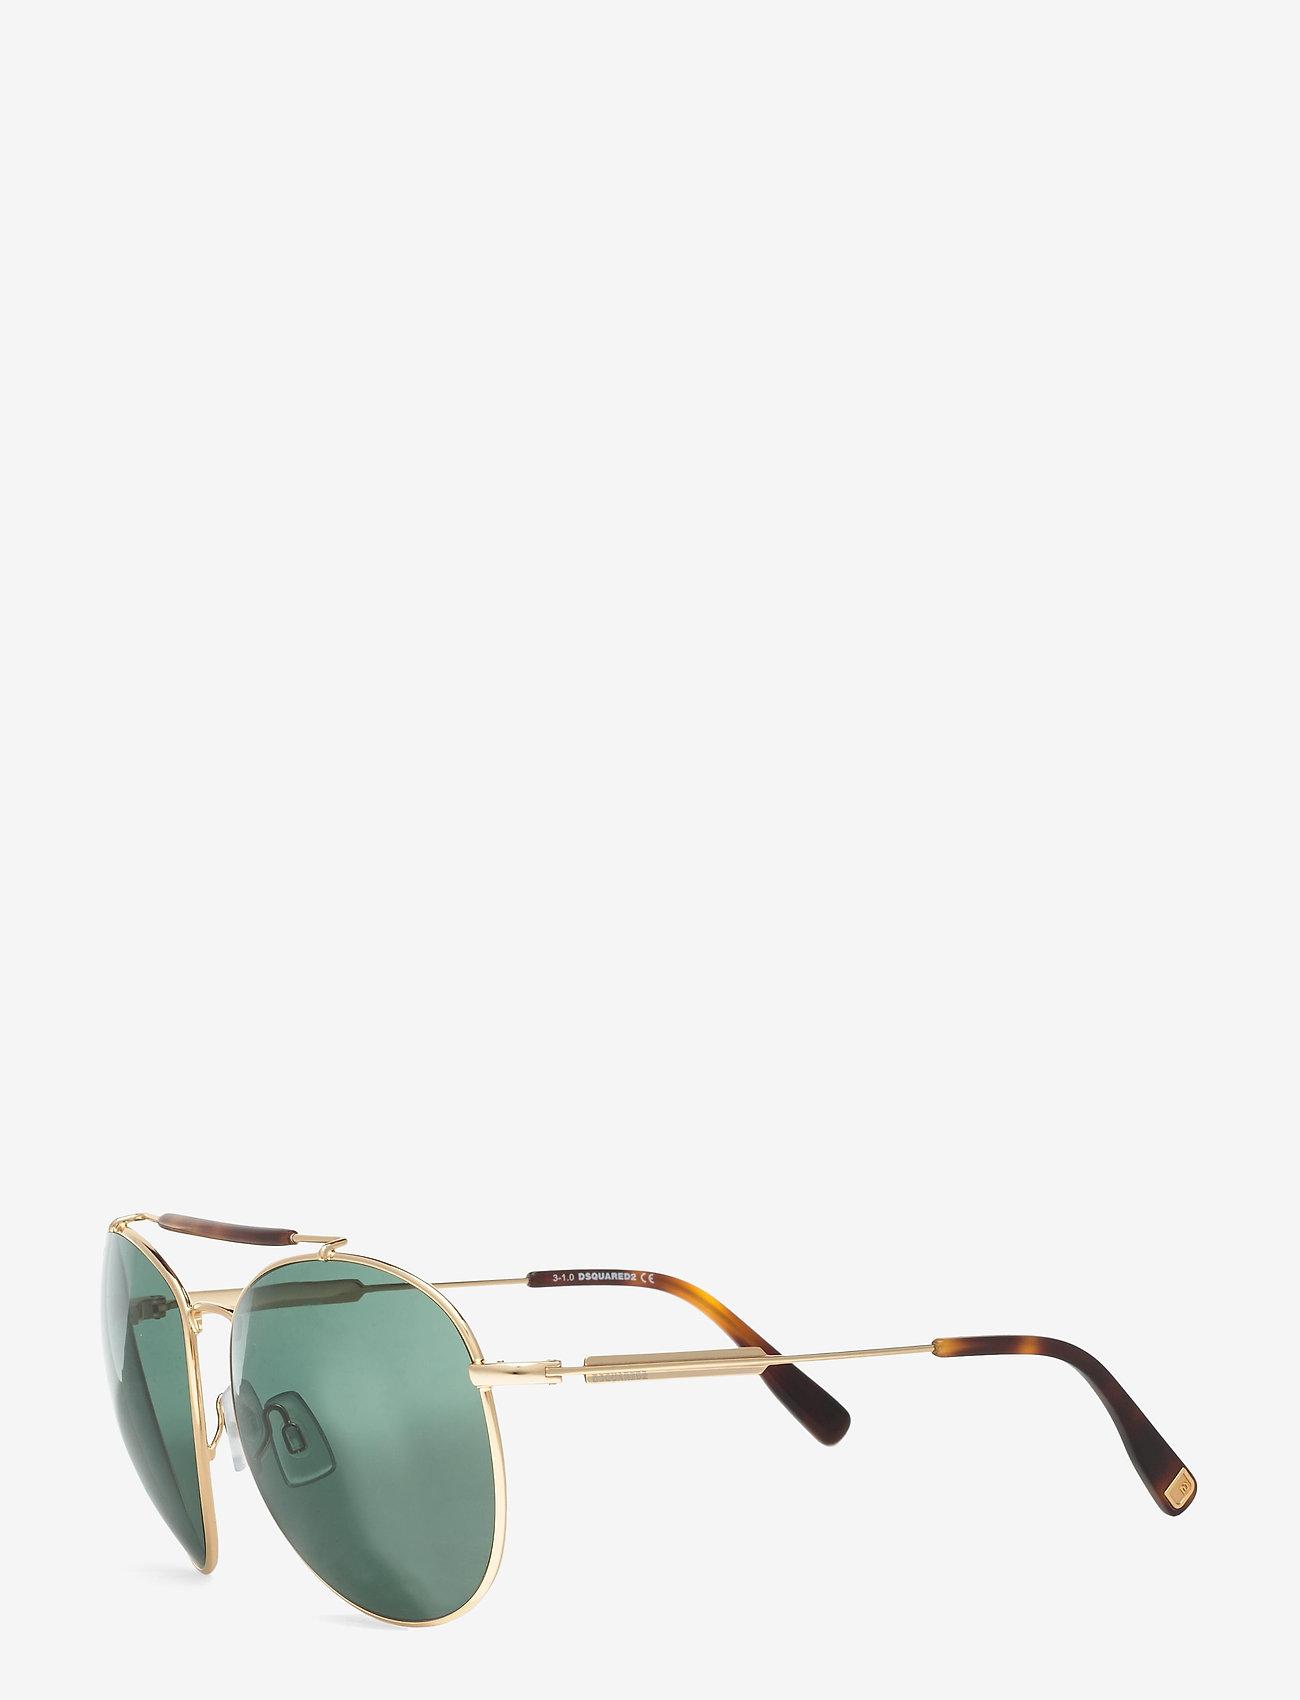 DSQUARED2 Sunglasses - MANUELLE - pilot - shiny deep gold - 1